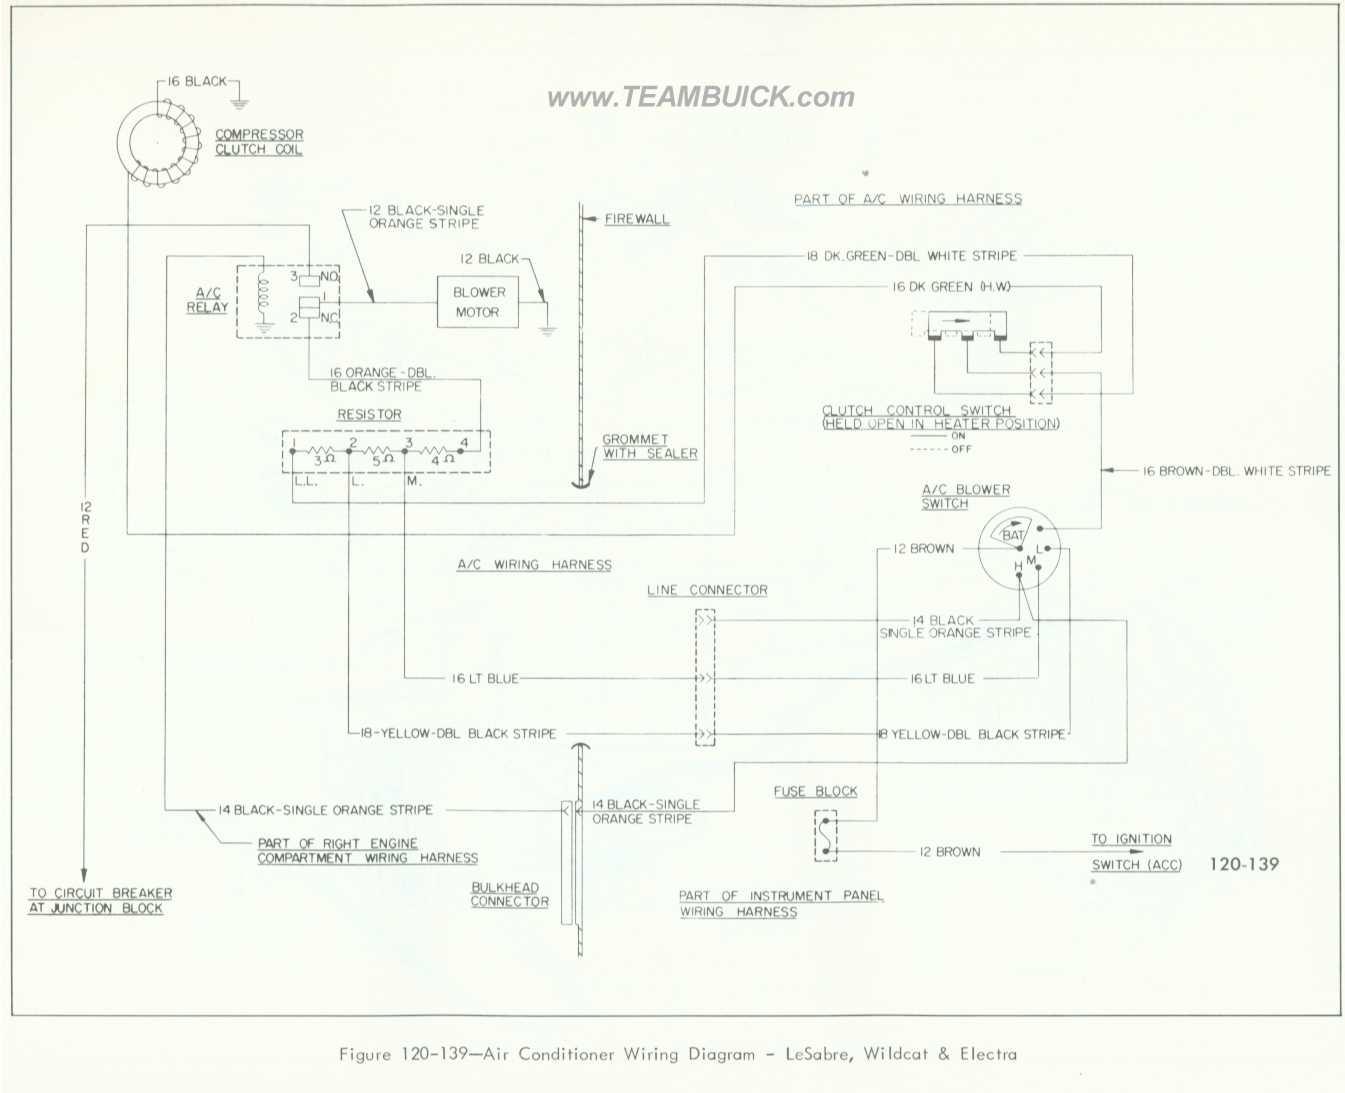 heil ac wiring diagram chinese atv arcoaire furnace parts hallmark